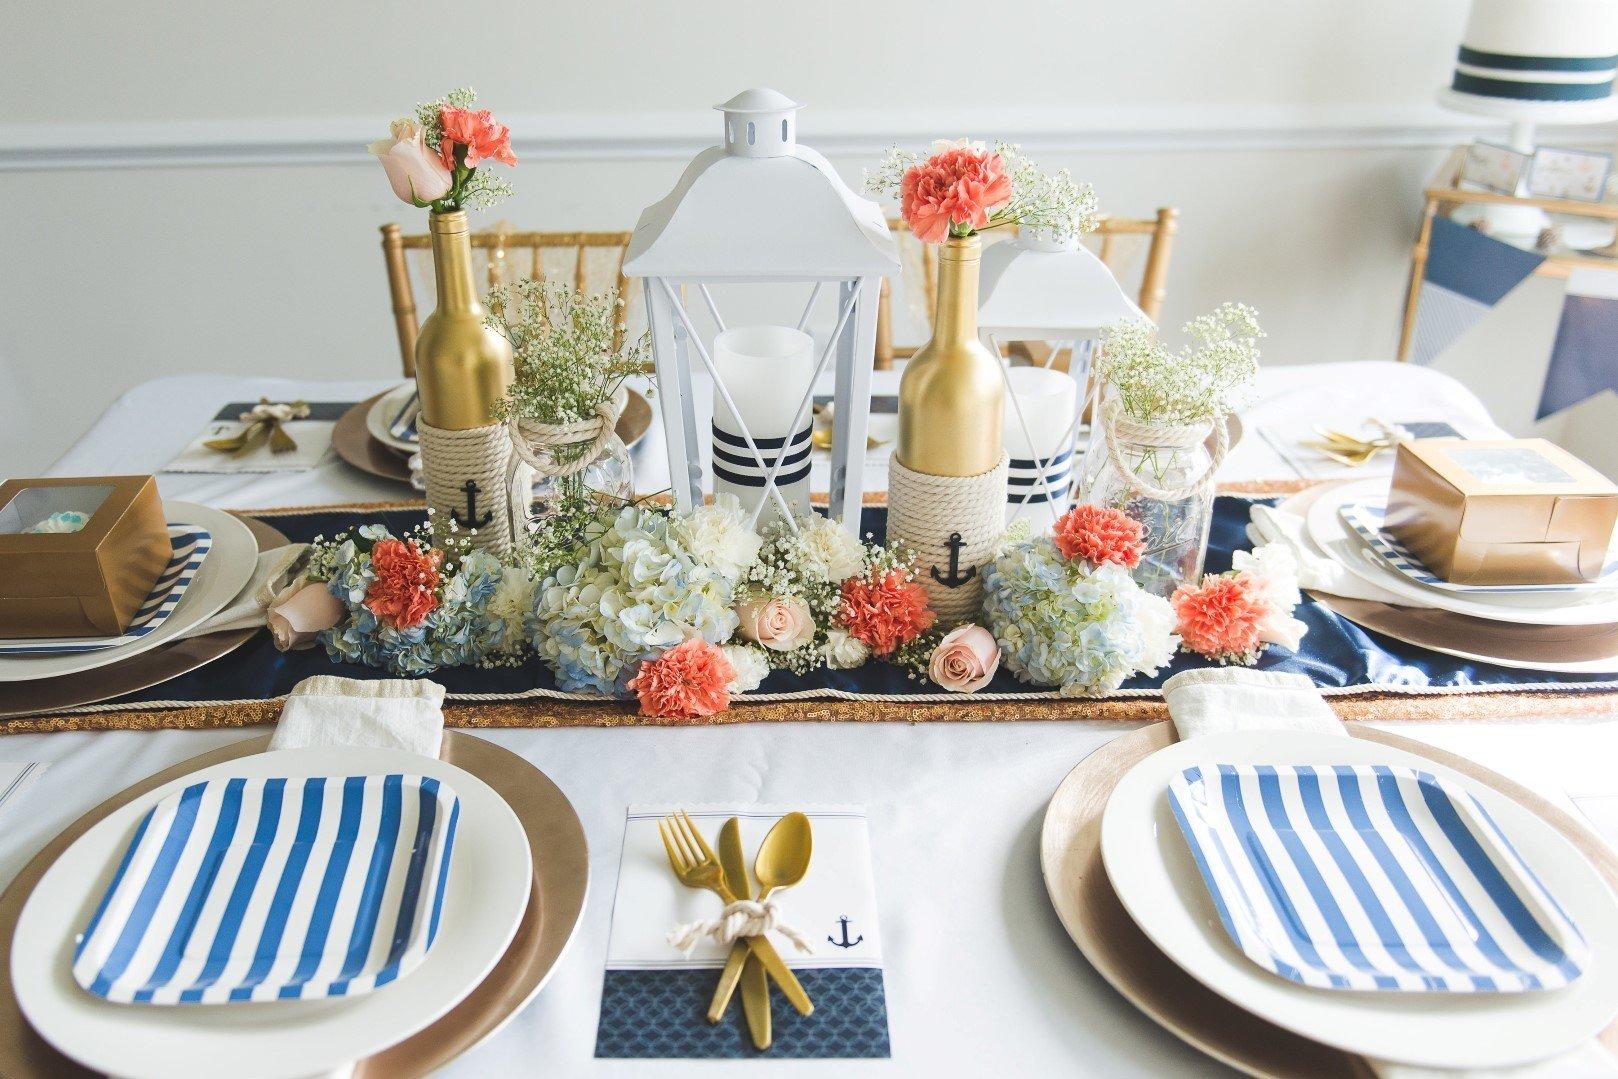 Декор стола в морском стиле